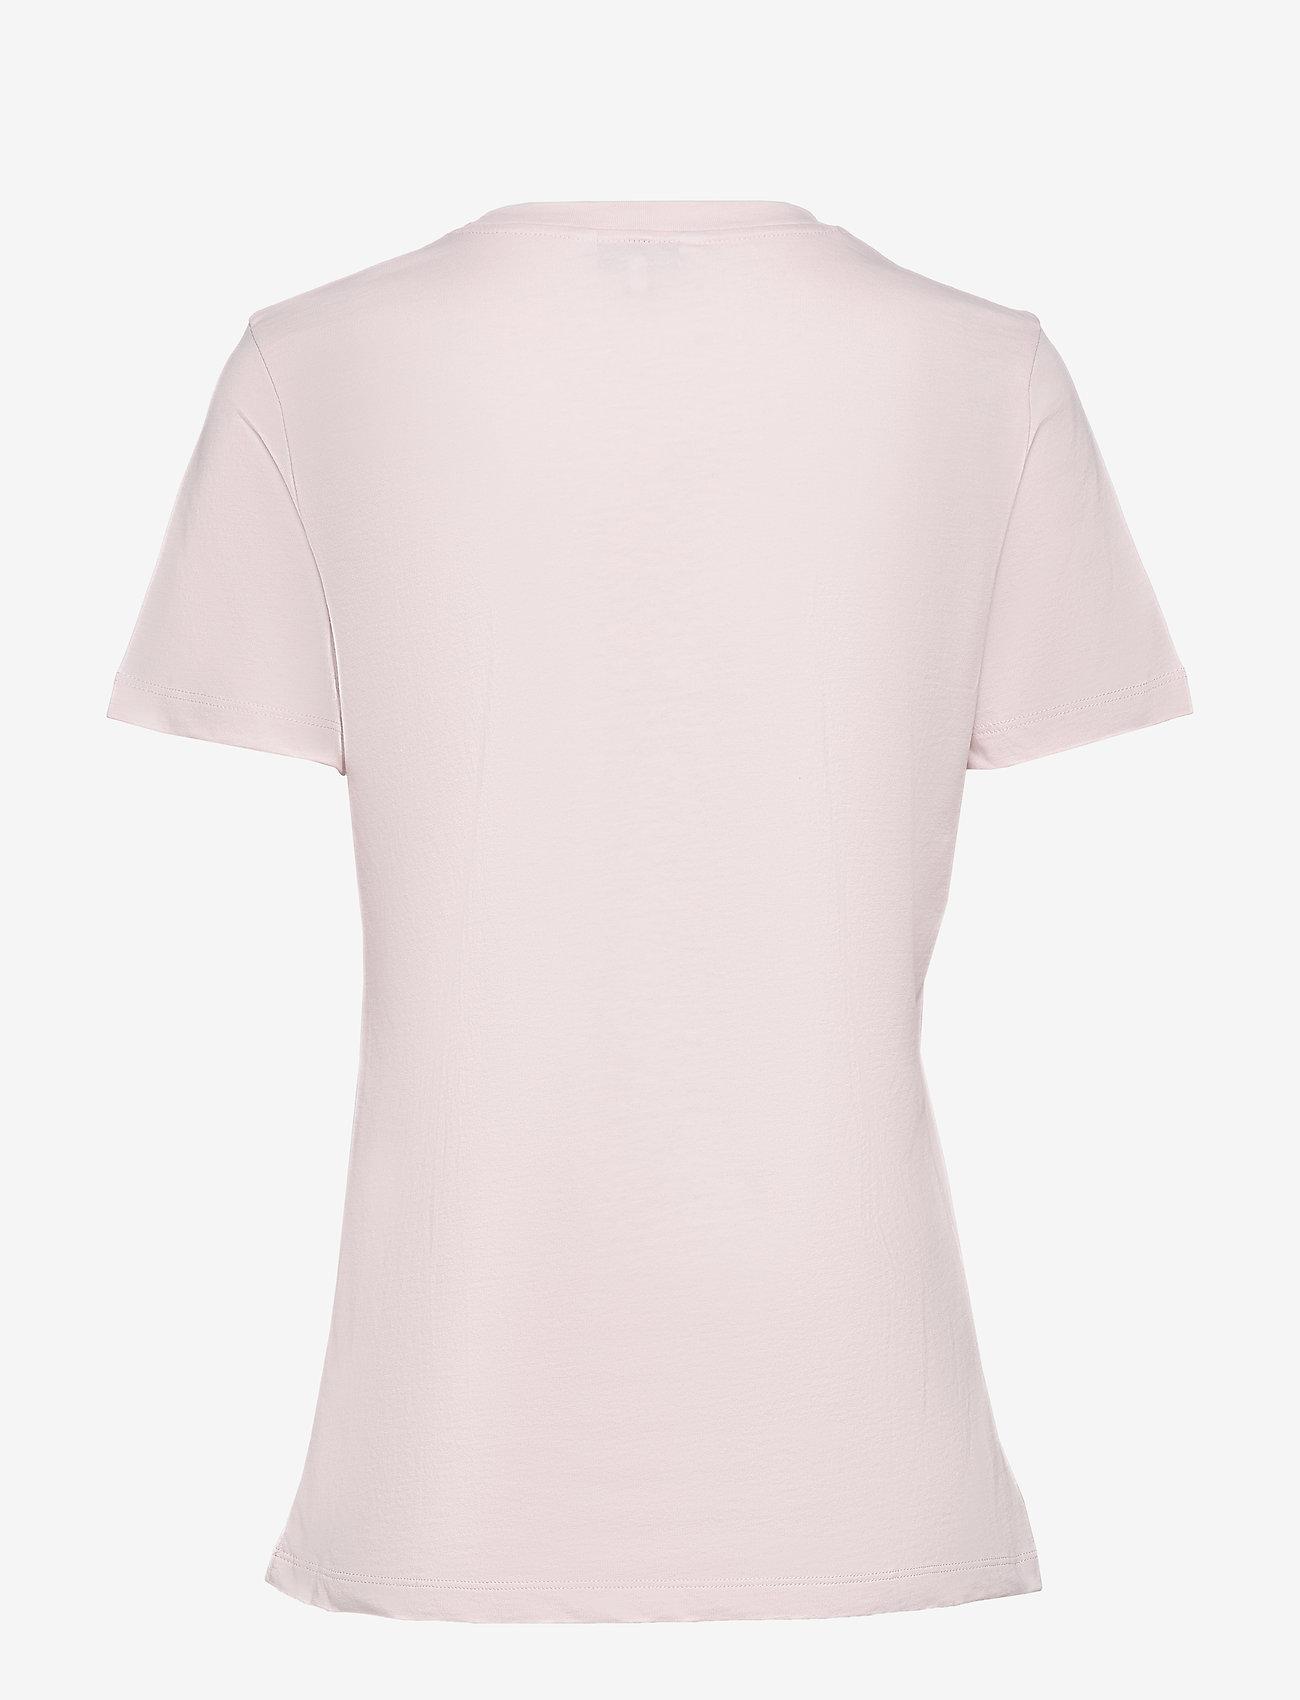 Tommy Hilfiger - NEW TH ESS HILFIGER - logo t-shirts - pale pink